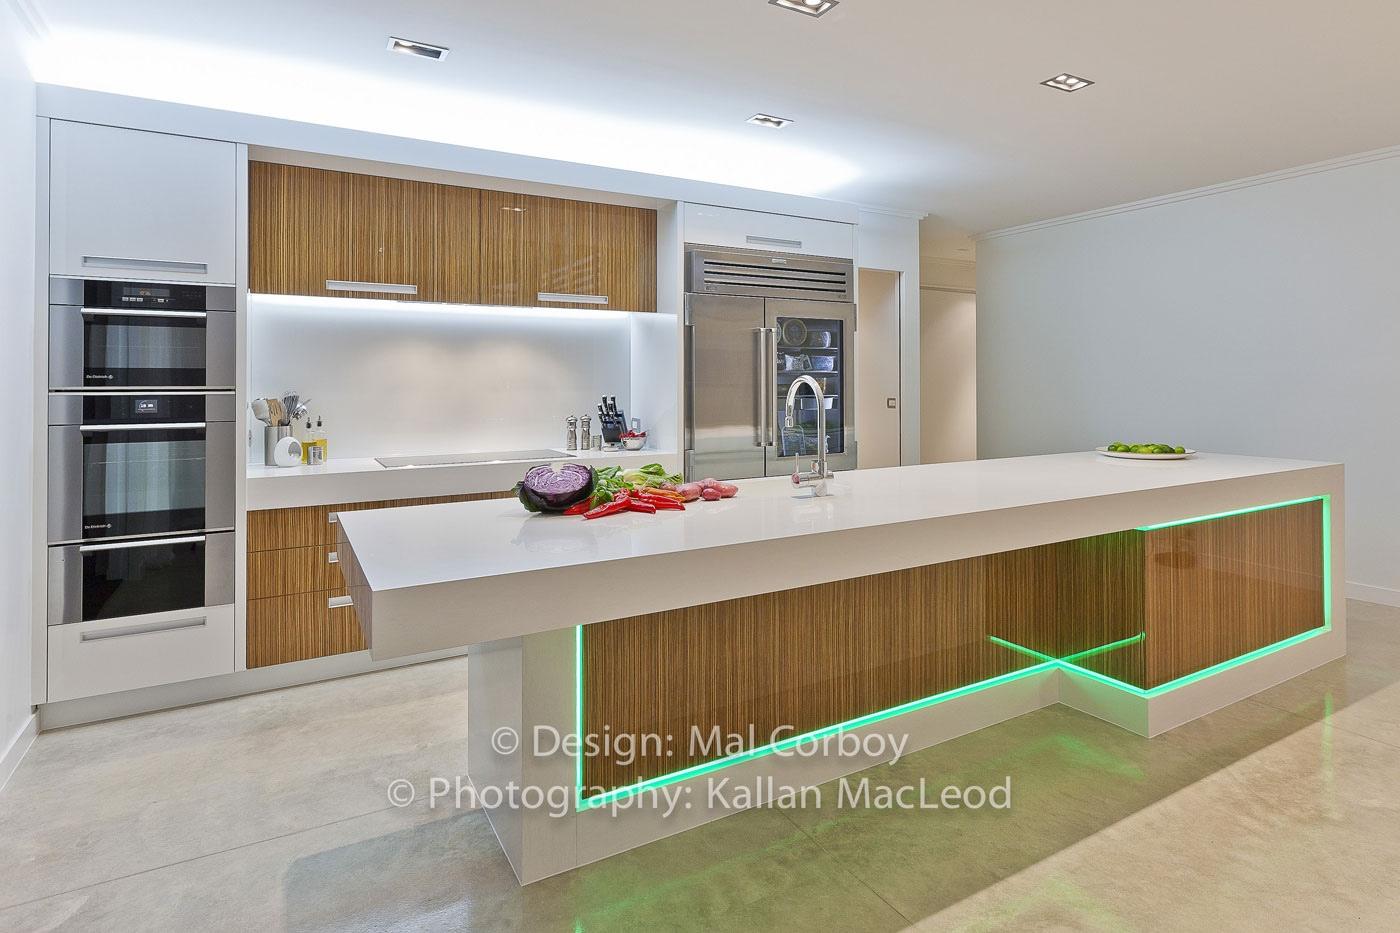 17 light filled modern kitchens by mal corboy kitchen led lighting